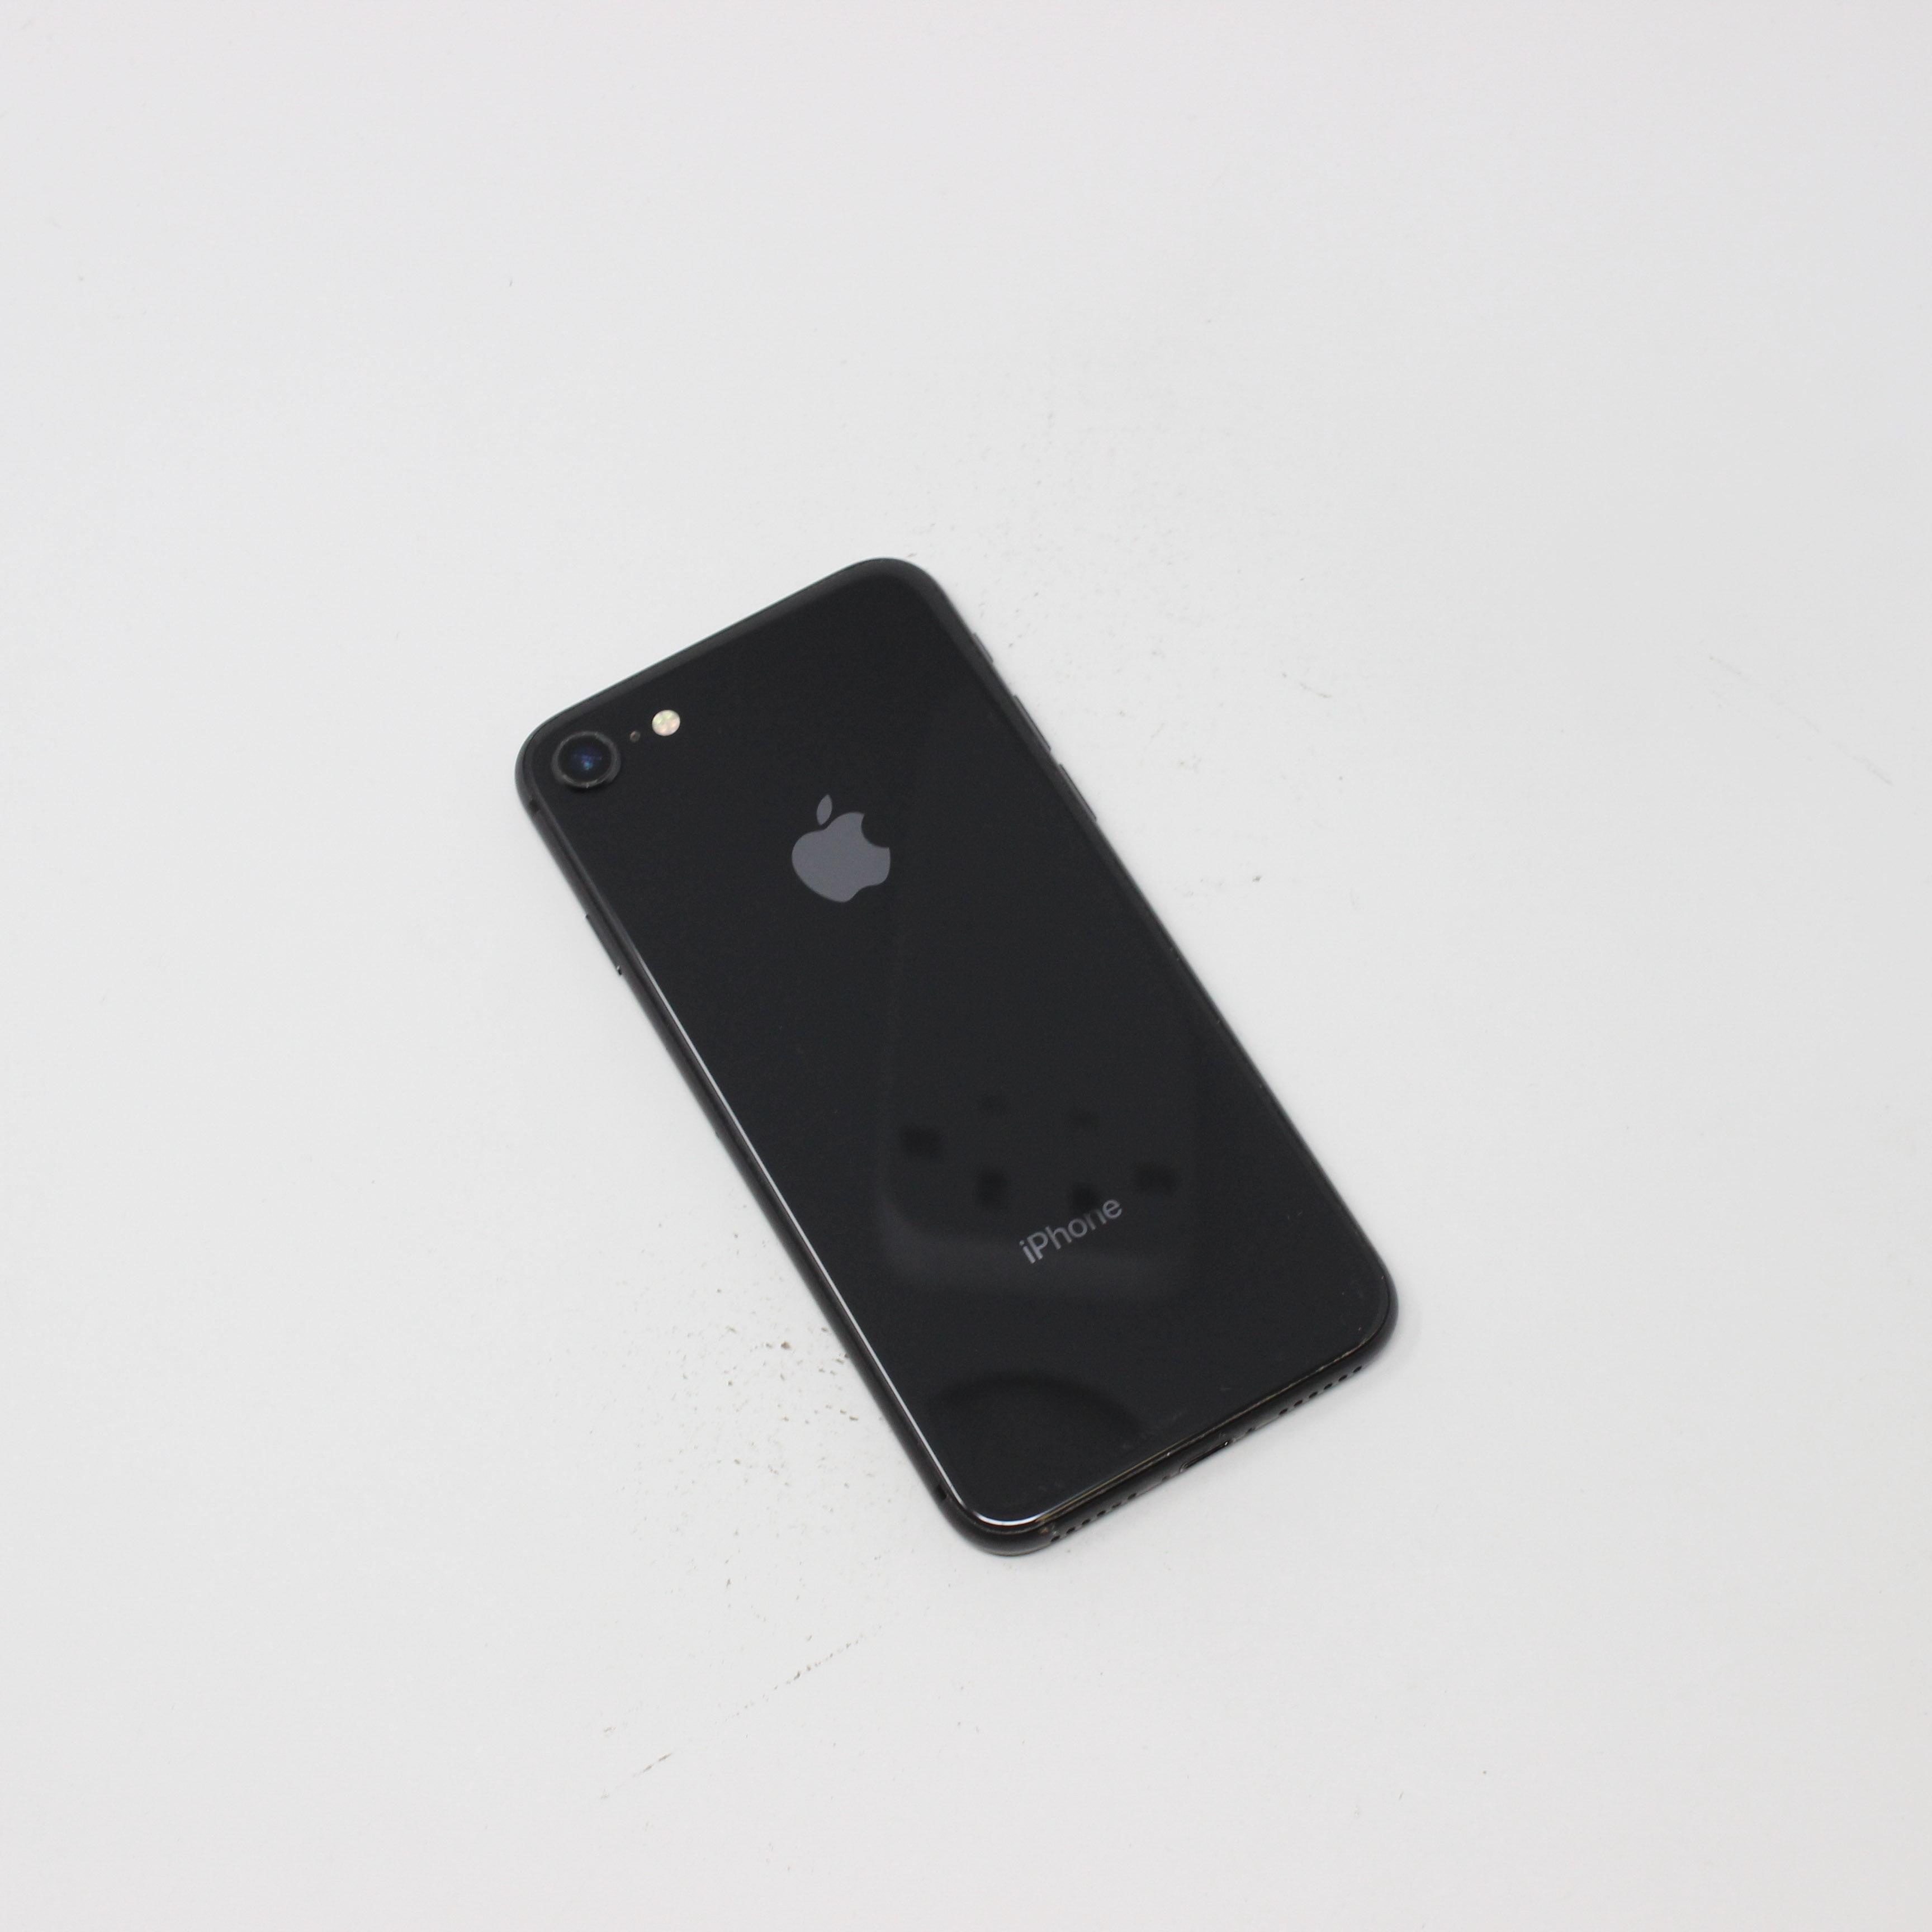 iPhone 8 64GB Space Gray - Verizon photo 3 | UpTradeit.com